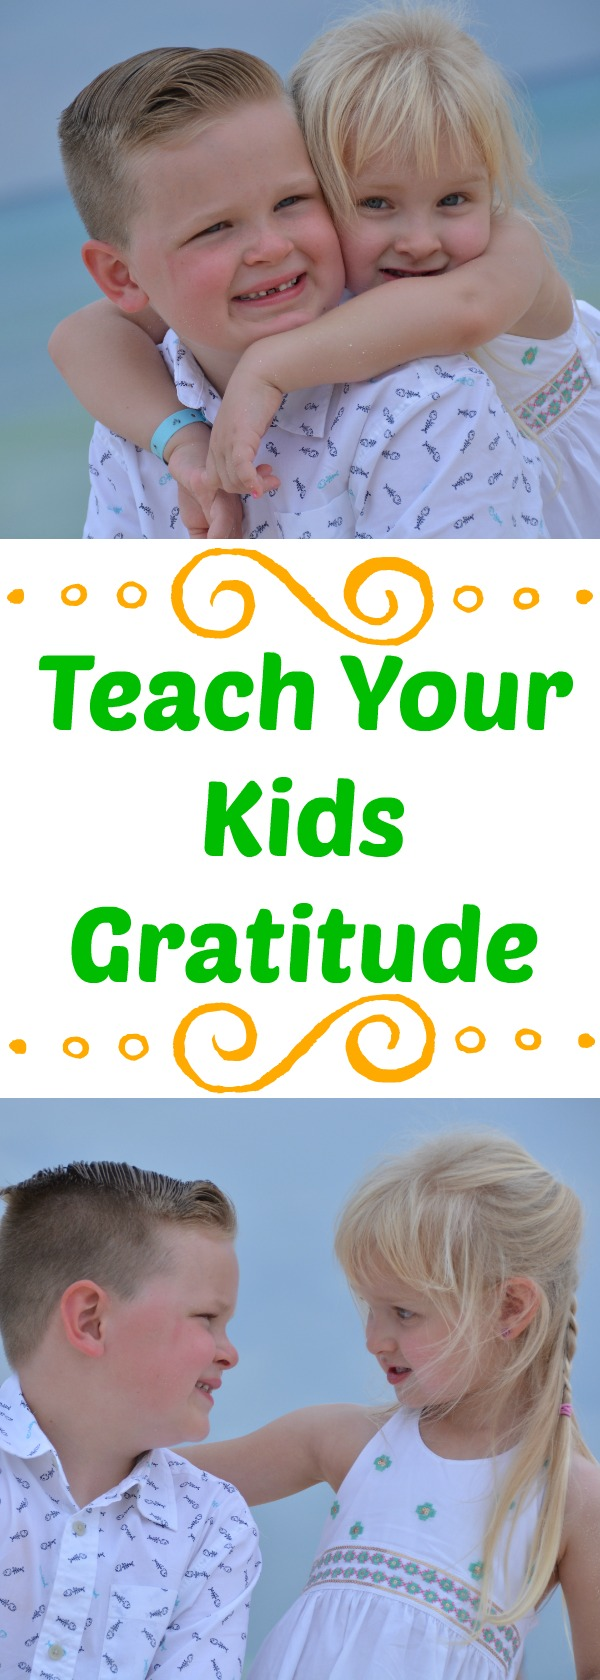 How to teach your kids gratitude, teaching kids gratitude, how to teach gratitude, parenting tips, raising grateful kids, teaching respect